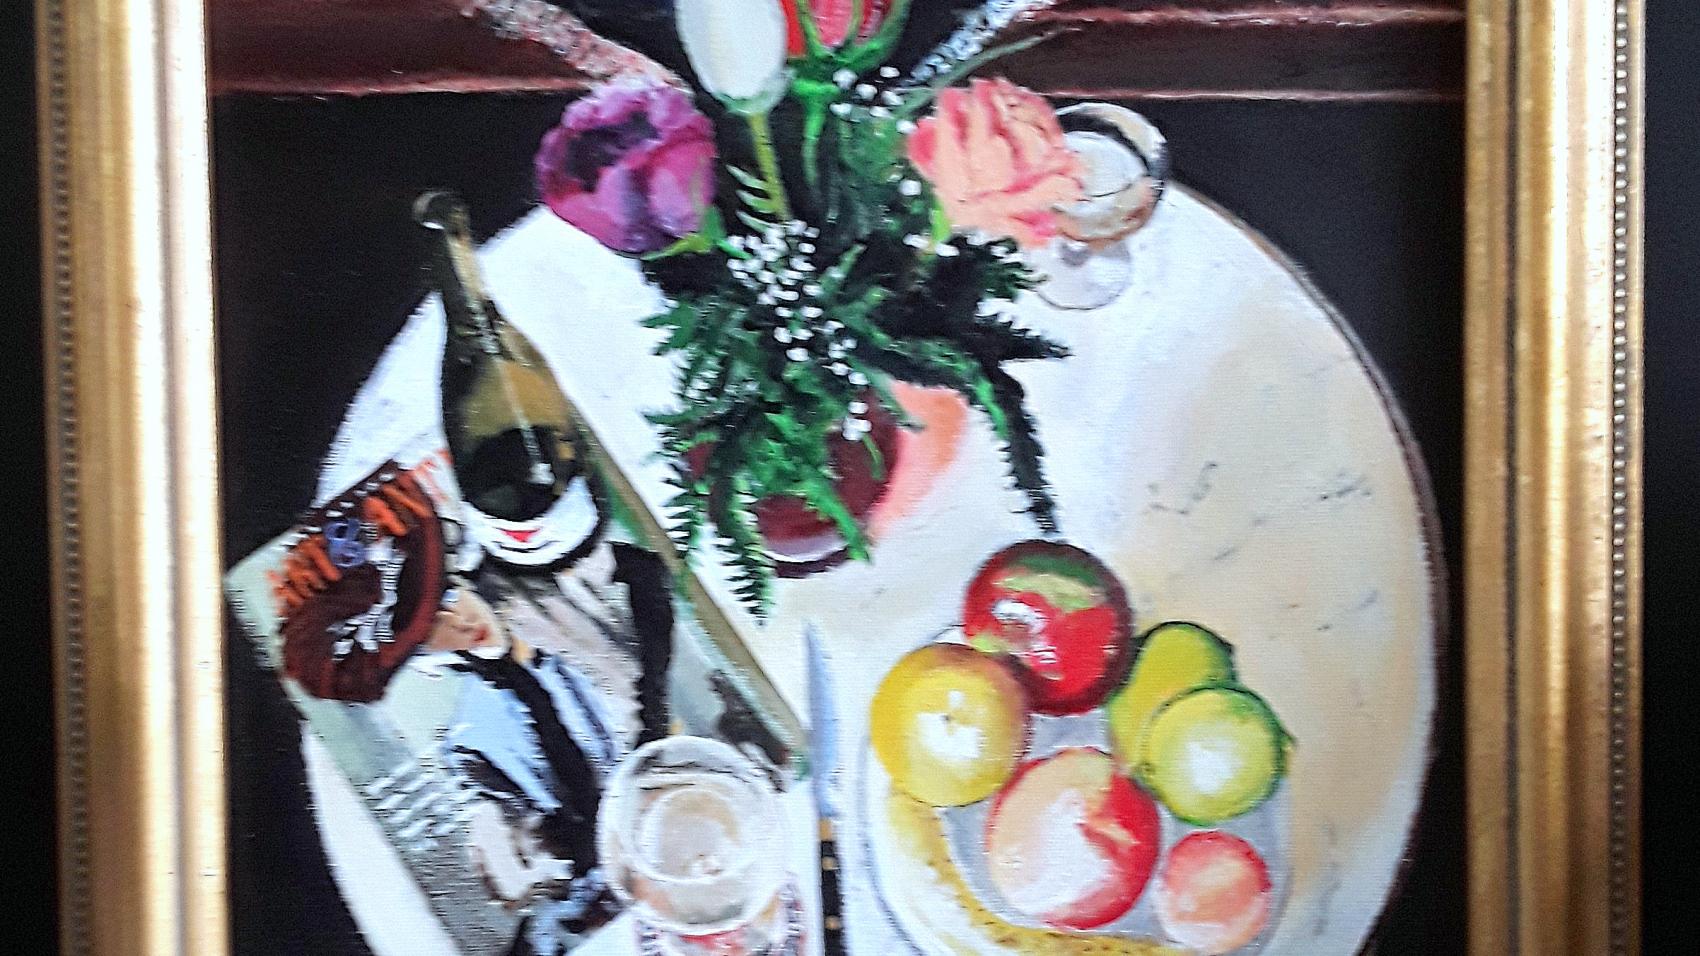 Wine Roses Chagall JKarr 2000